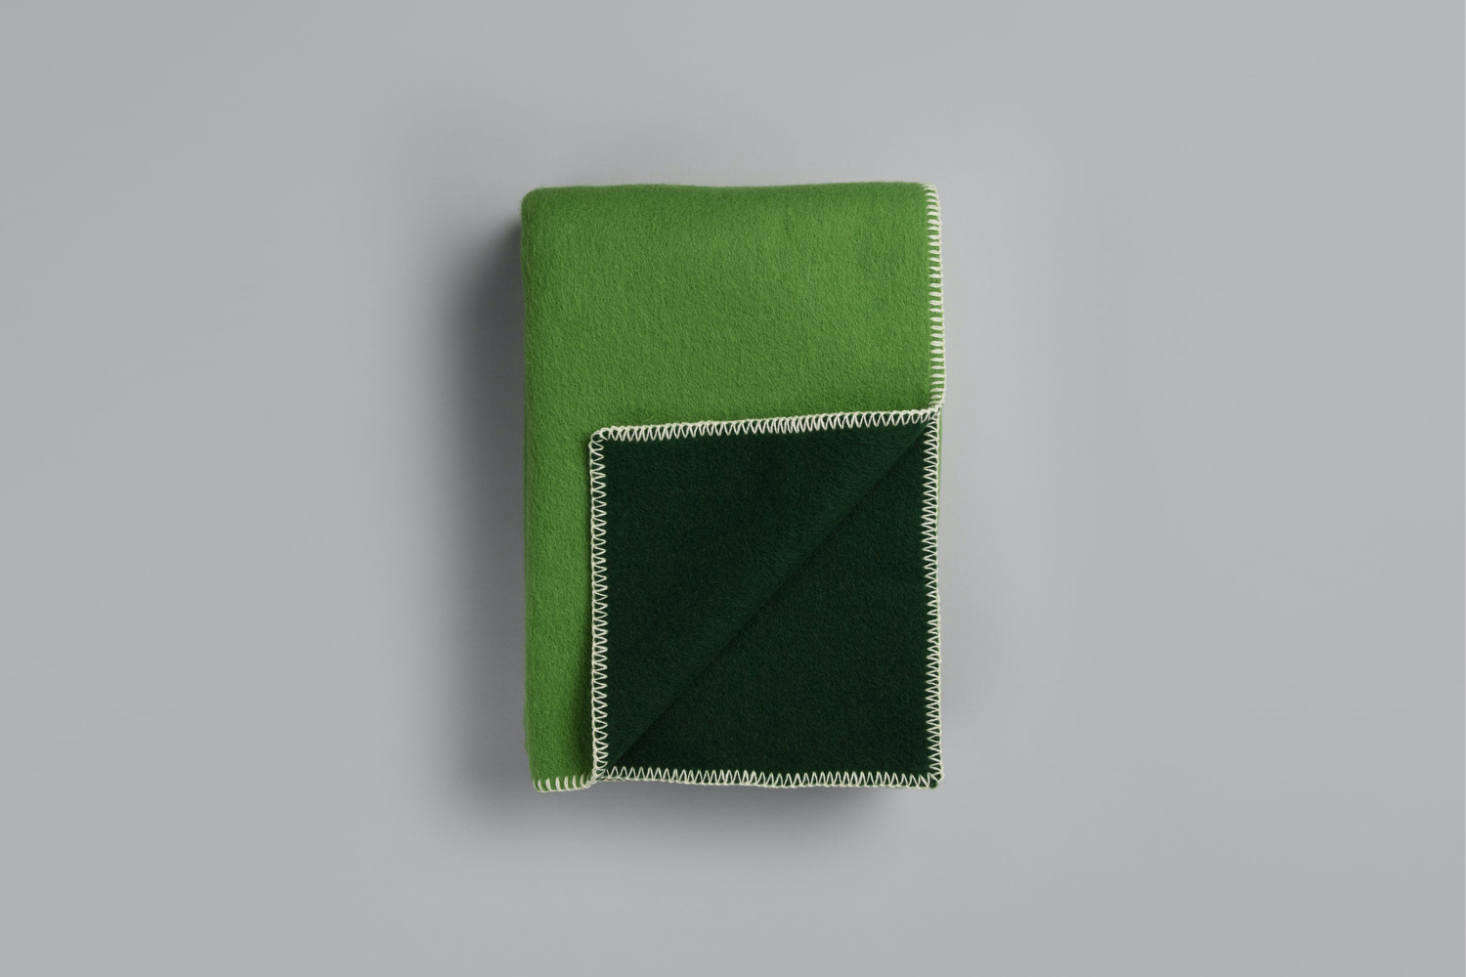 The two-toned Stemor Blanket designed by Kristine Five Melvær for Roros Tweed is $0 at Fjørn Scandinavian.